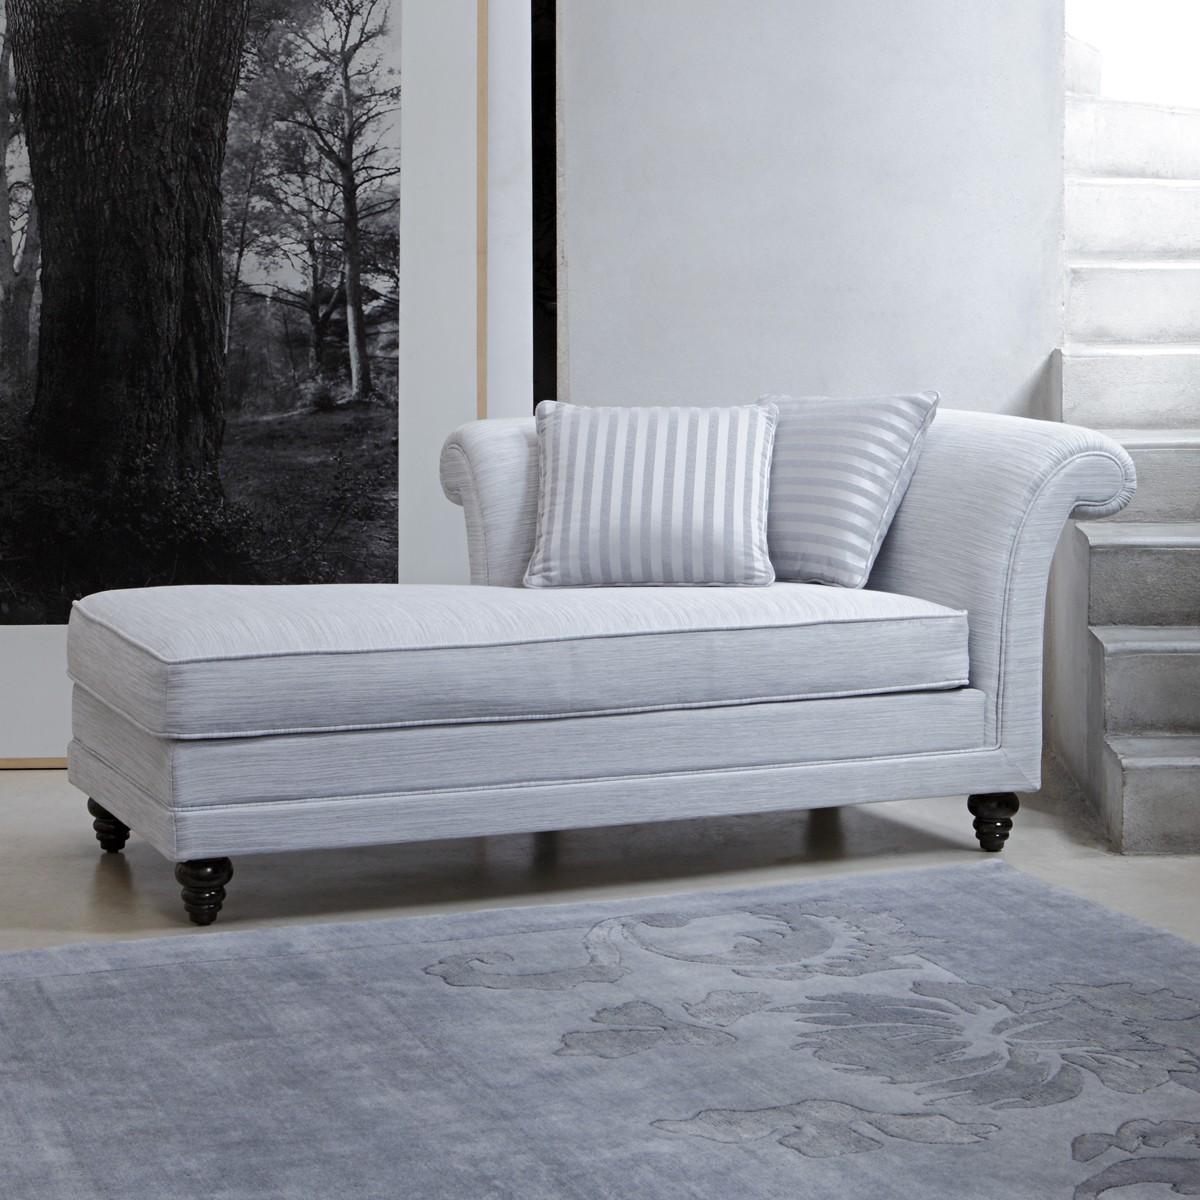 zahradeco meridiennes. Black Bedroom Furniture Sets. Home Design Ideas